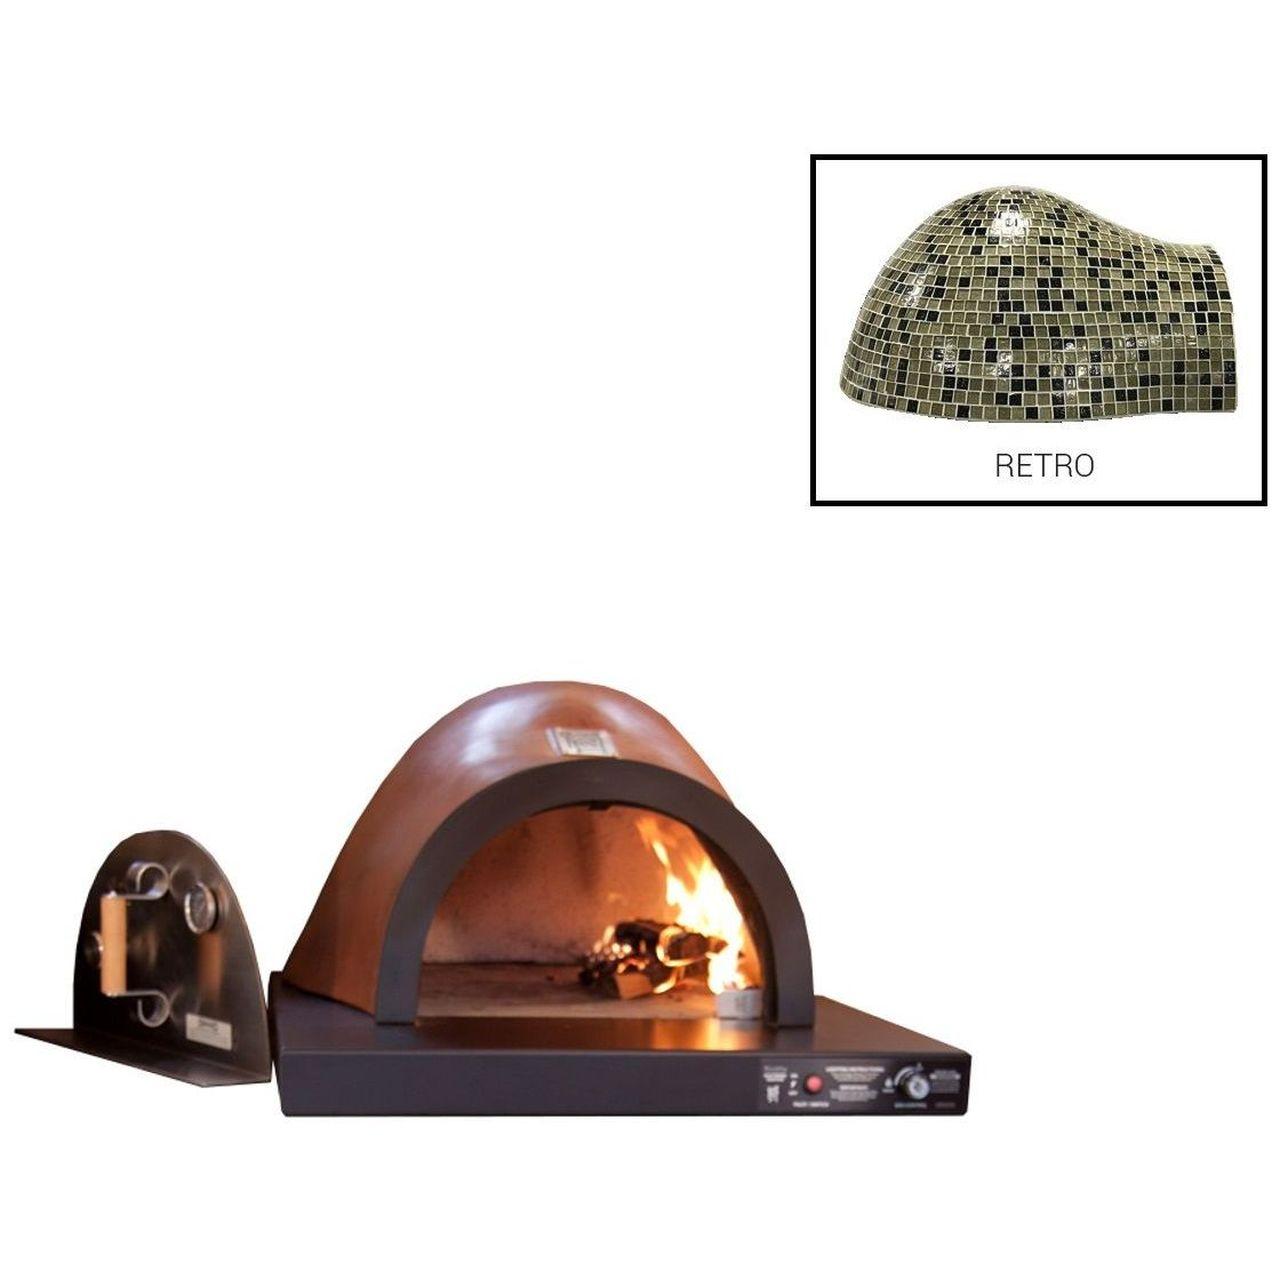 HPC Villa Hybrid Gas/Wood Oven With EI in Retro - LP